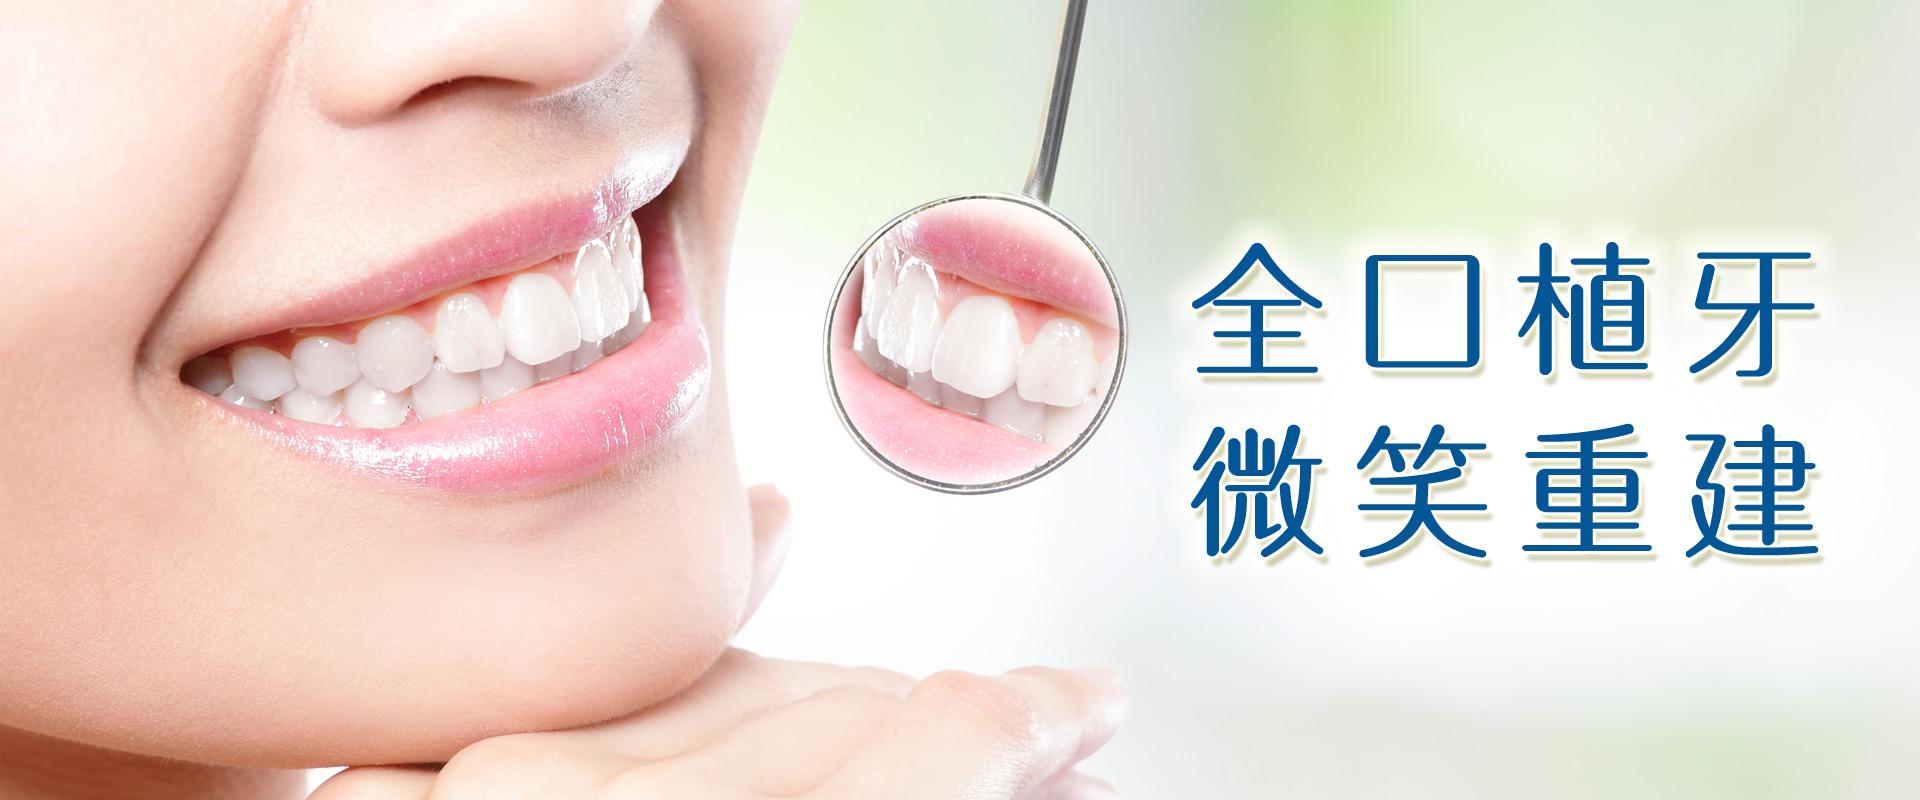 All-on-4植牙完美。尊榮醫療團隊